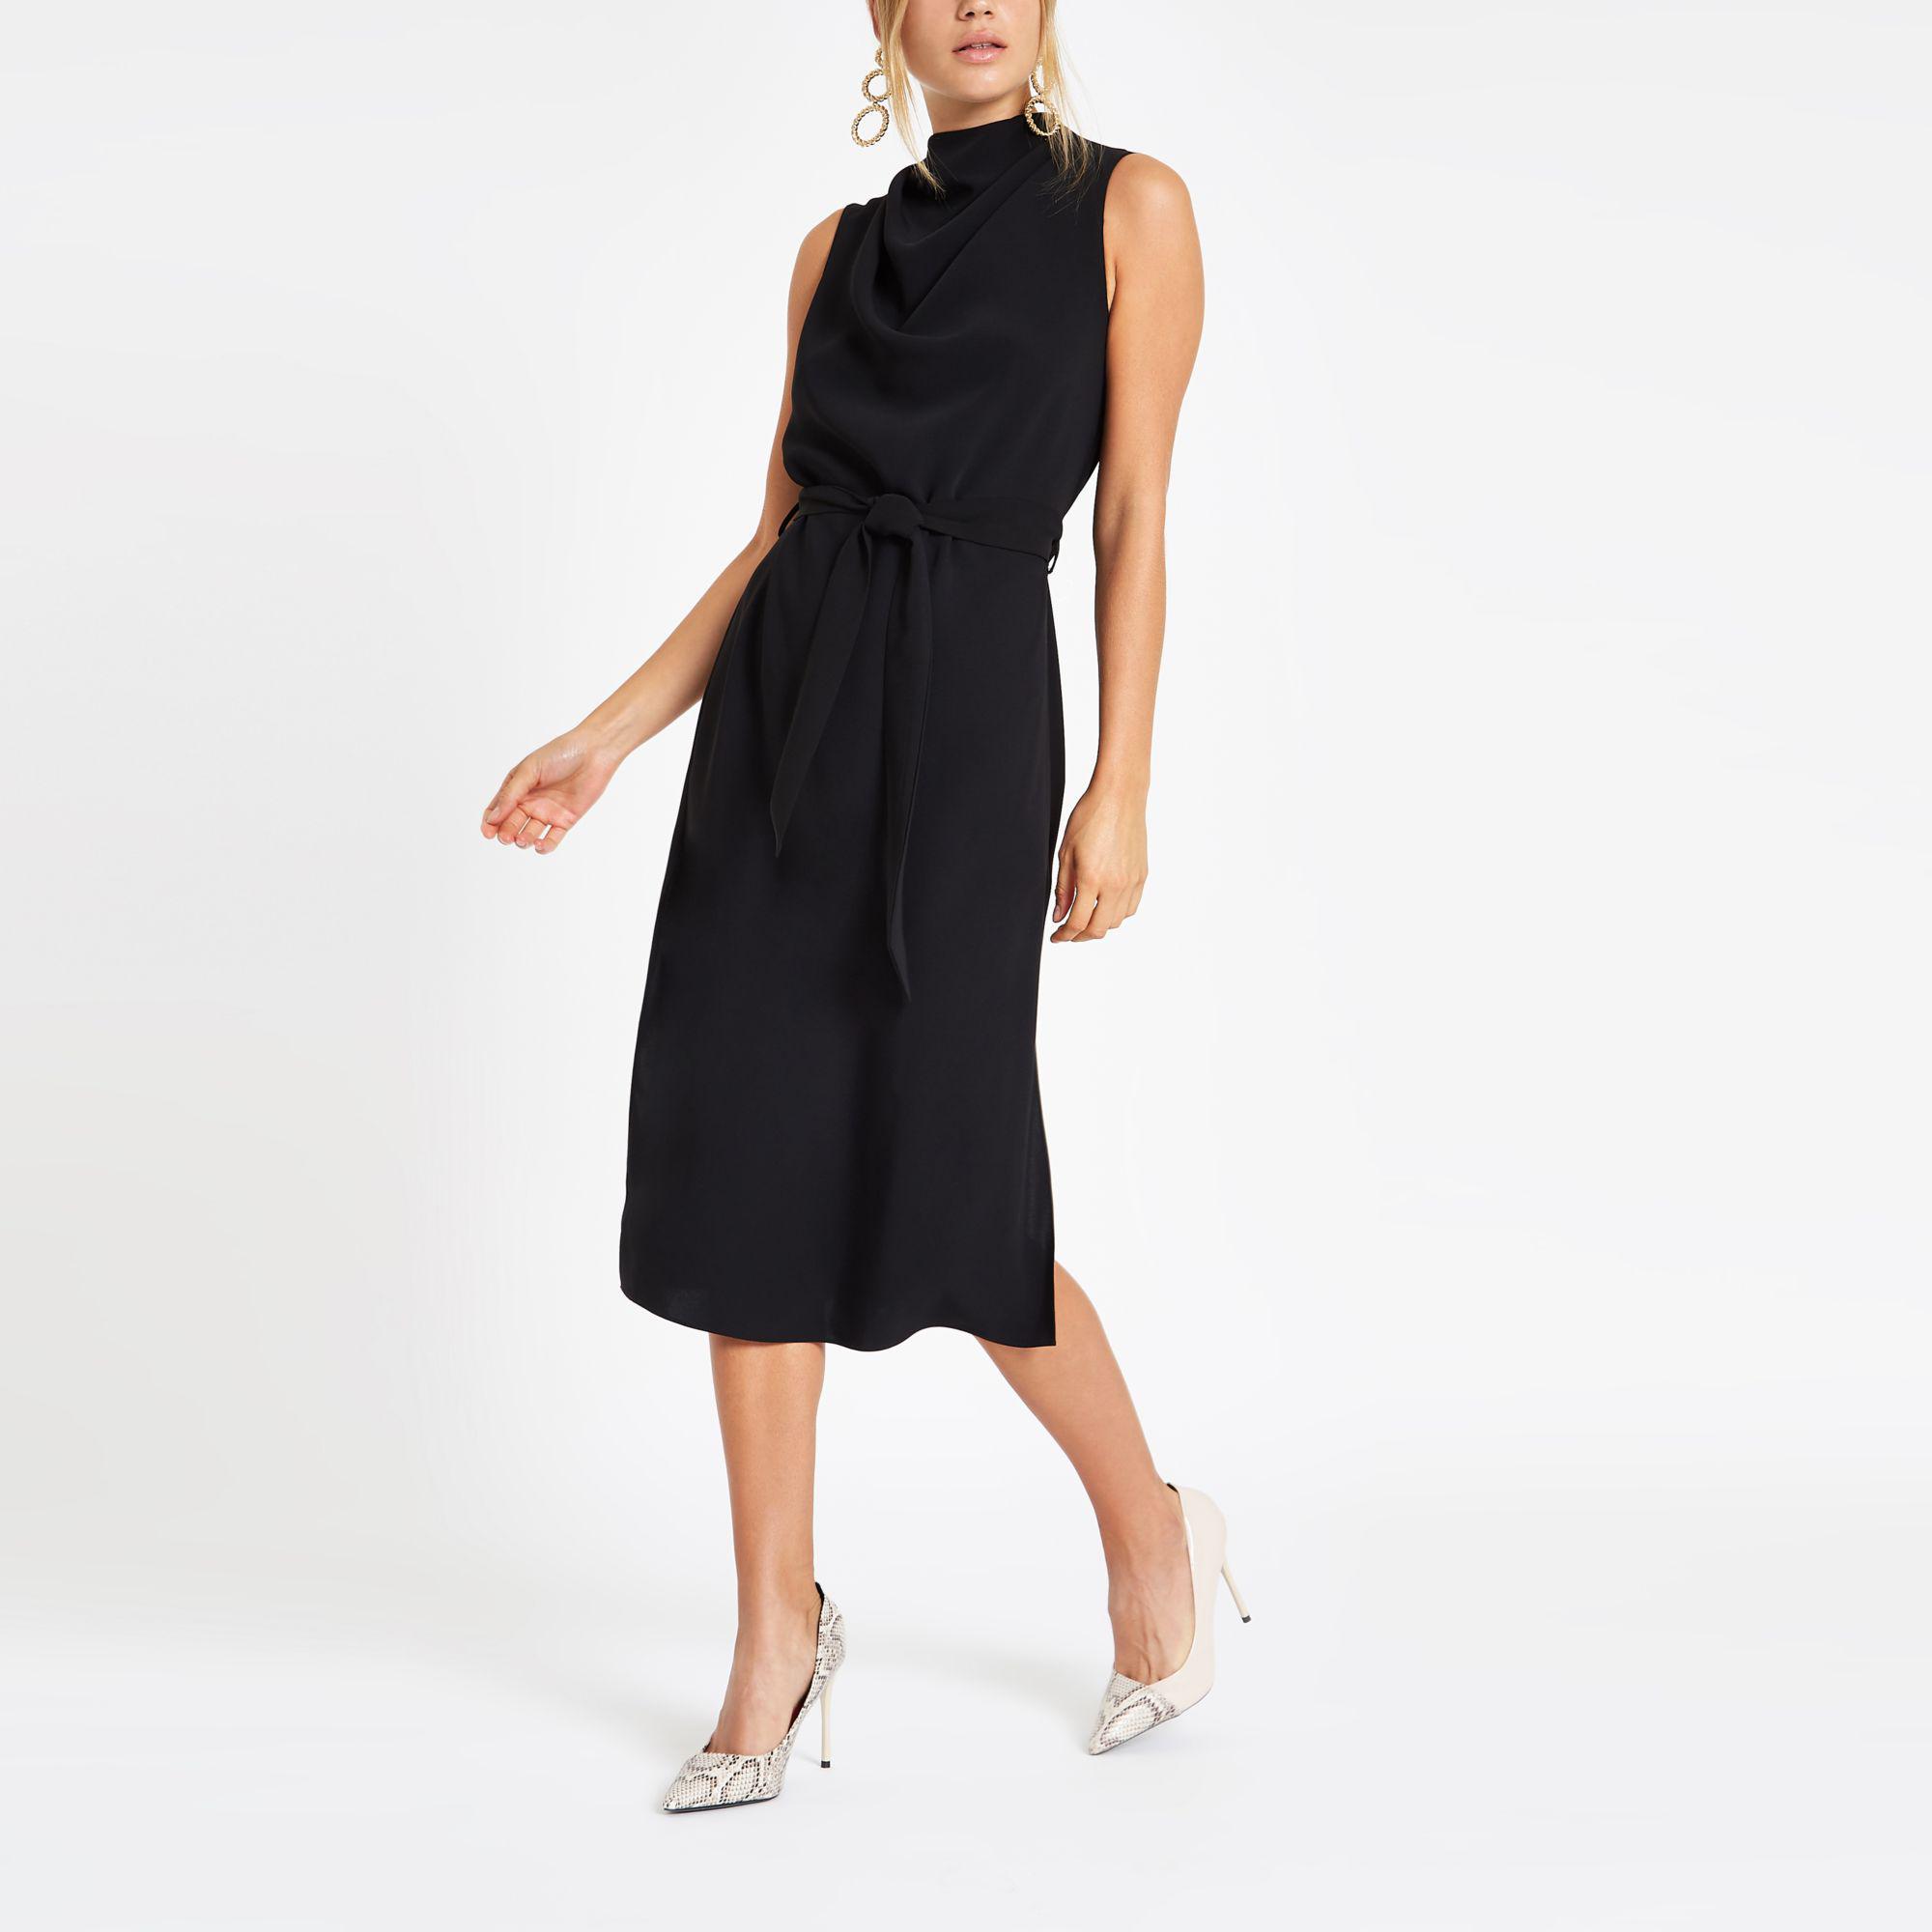 7ccb0c1801ab River Island Black High Neck Sleeveless Wrap Midi Dress in Black - Lyst